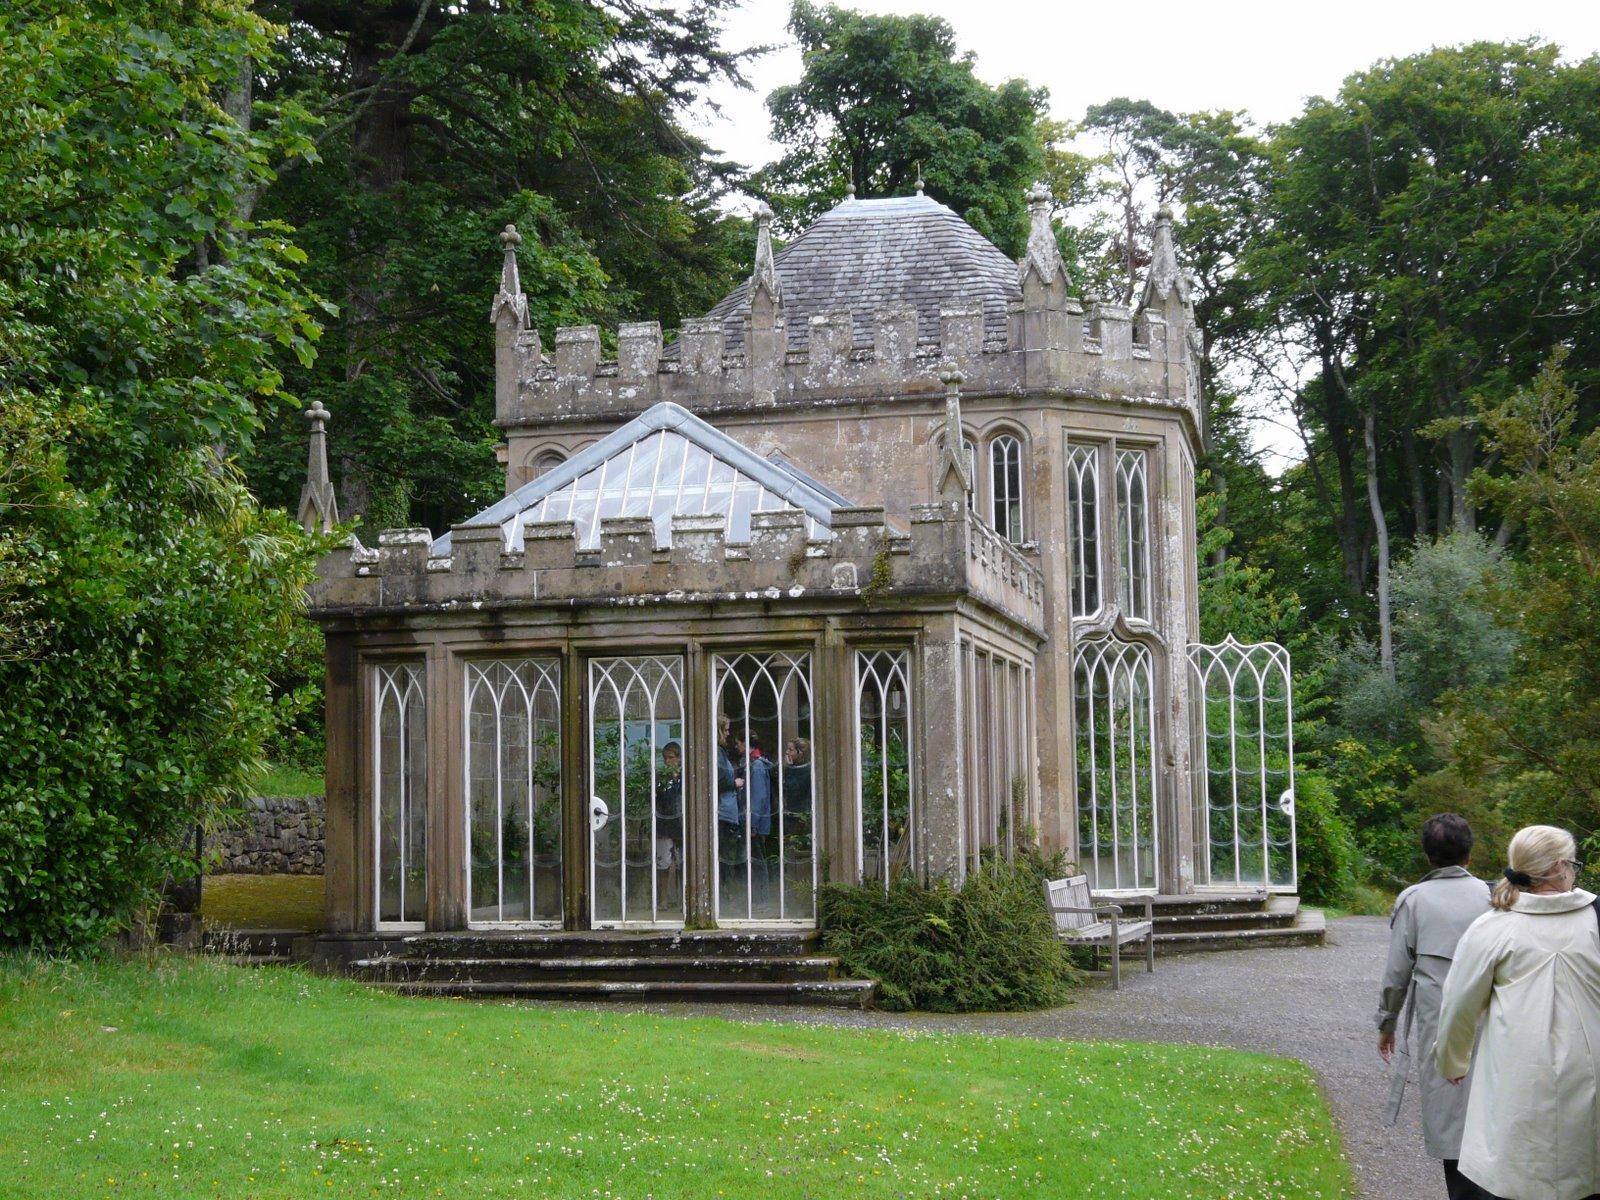 Tour culzean castle gardens scottish tour guide 39 s blog for Camellia homes